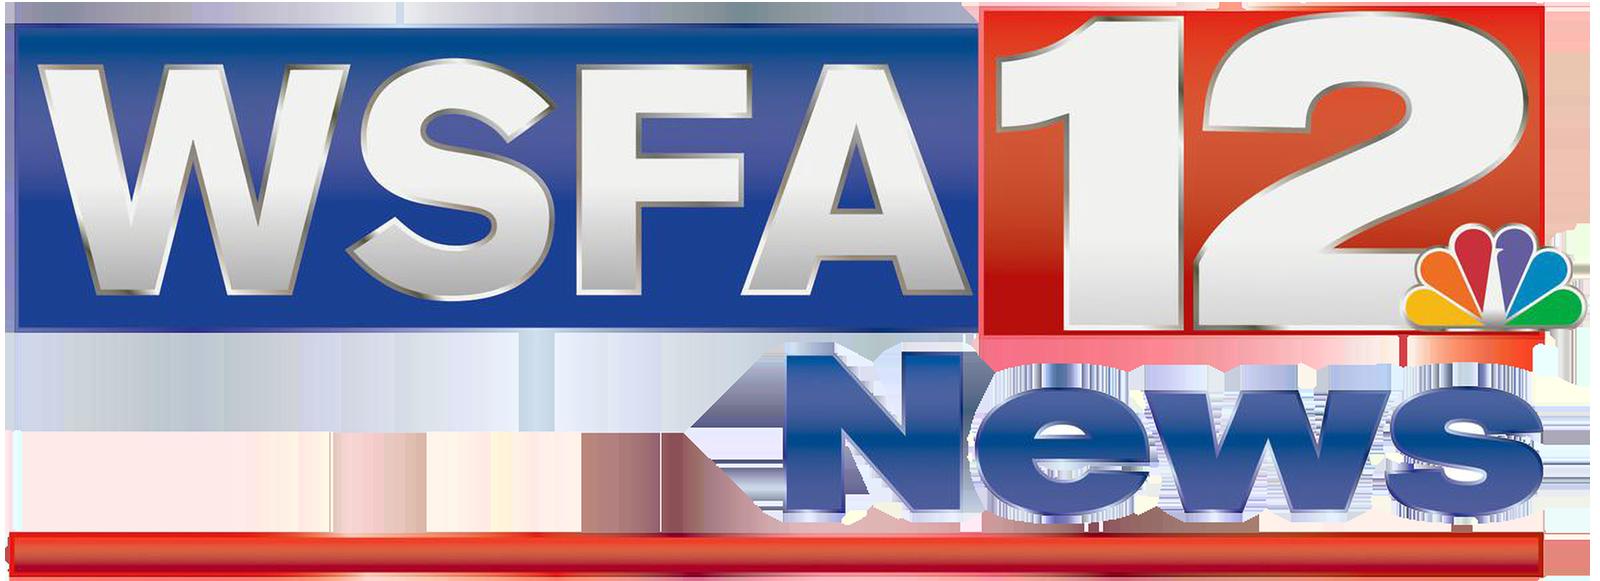 WSFA News logo